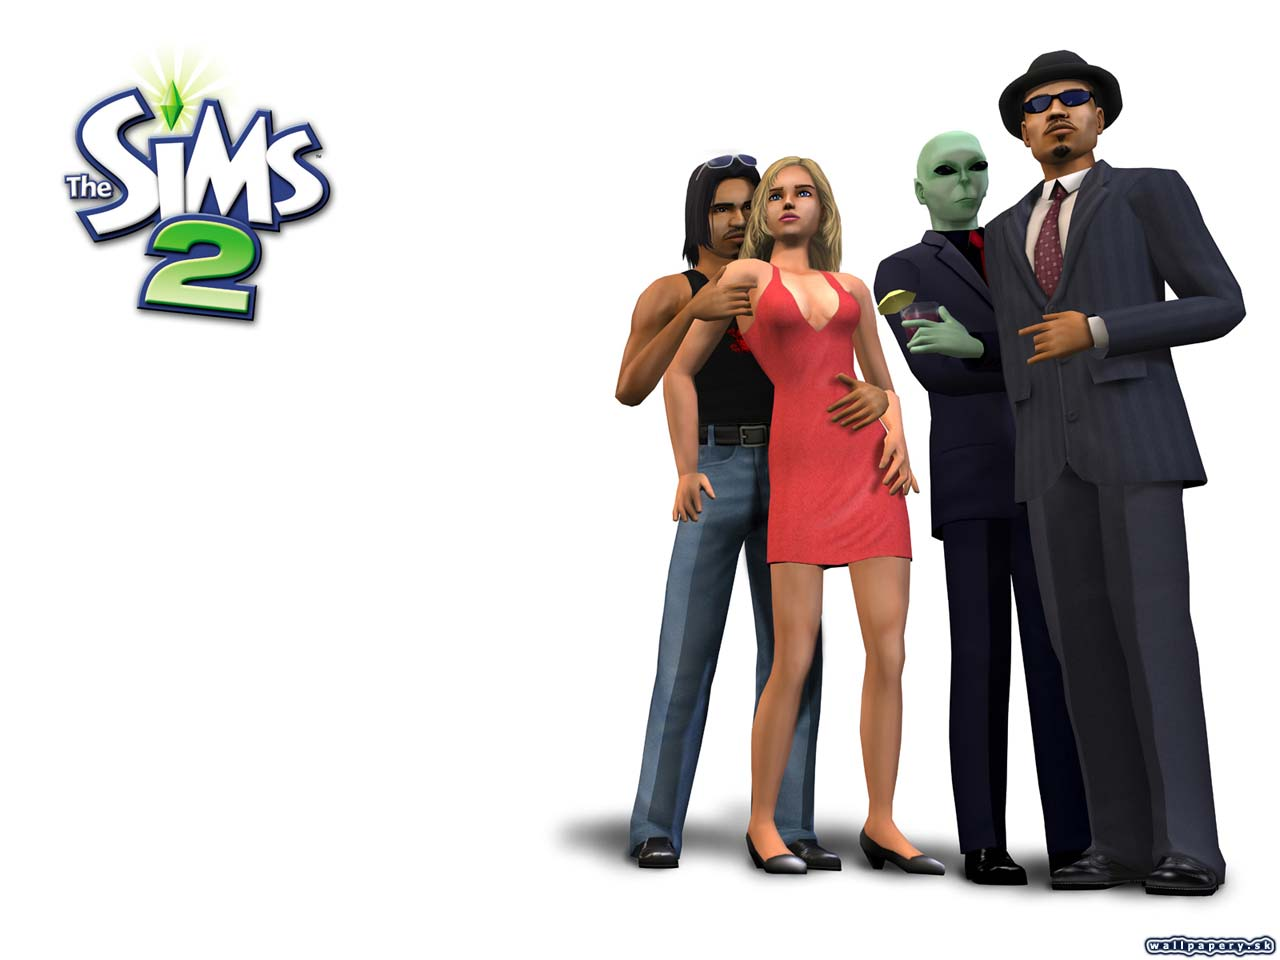 Sims 2 genitals mod hot coffee porn video